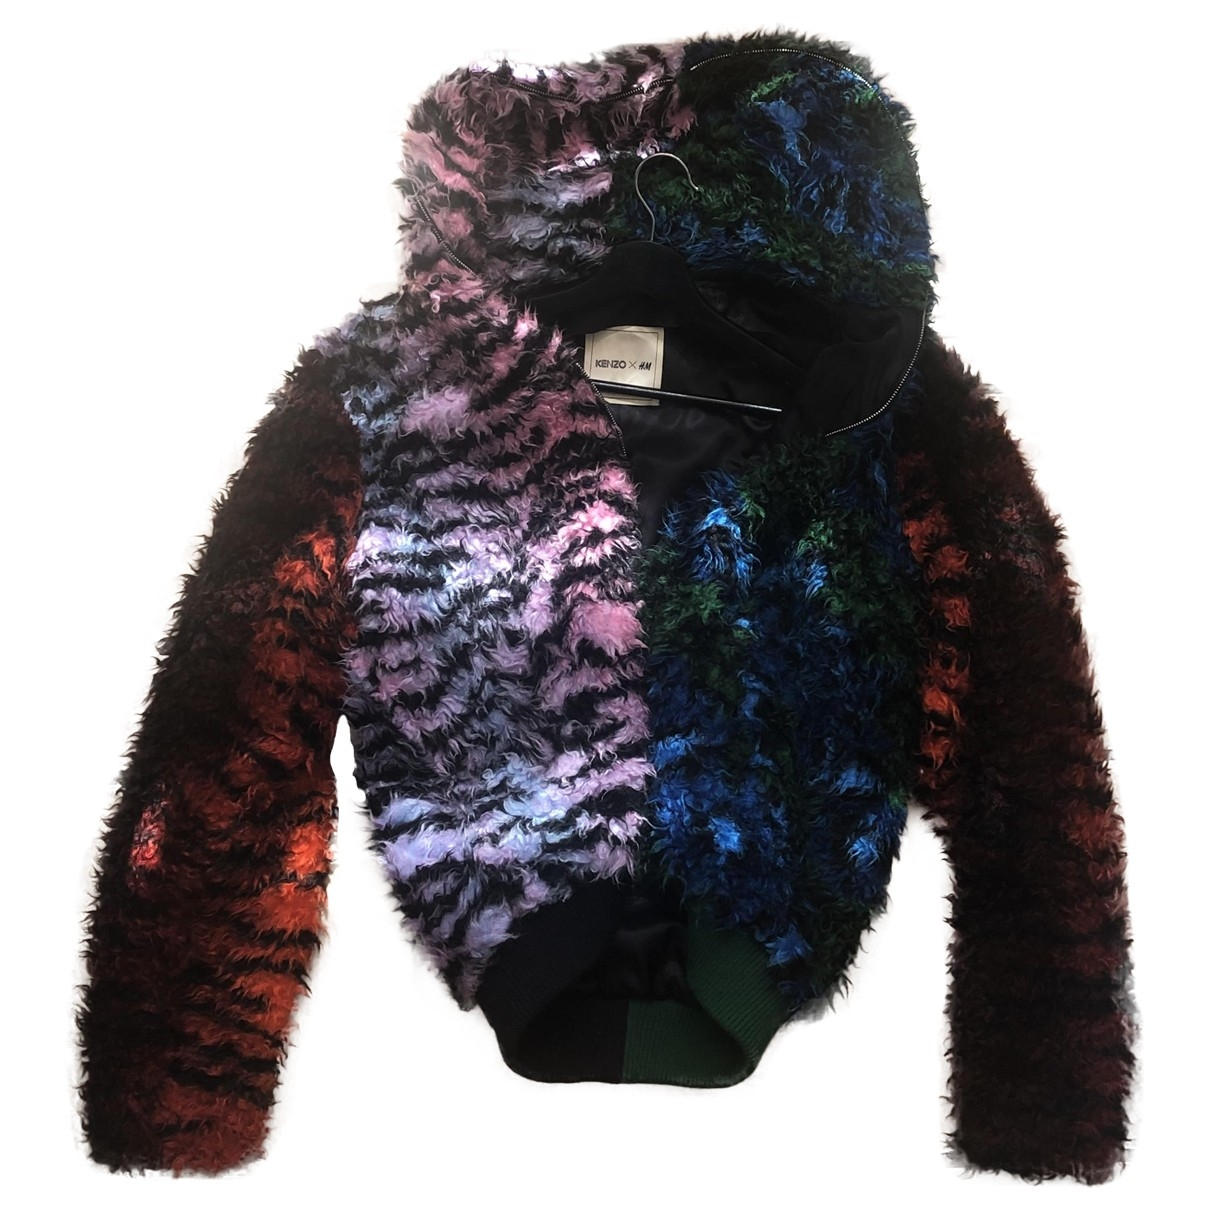 Kenzo X H&m \N Multicolour Faux fur jacket for Women L International